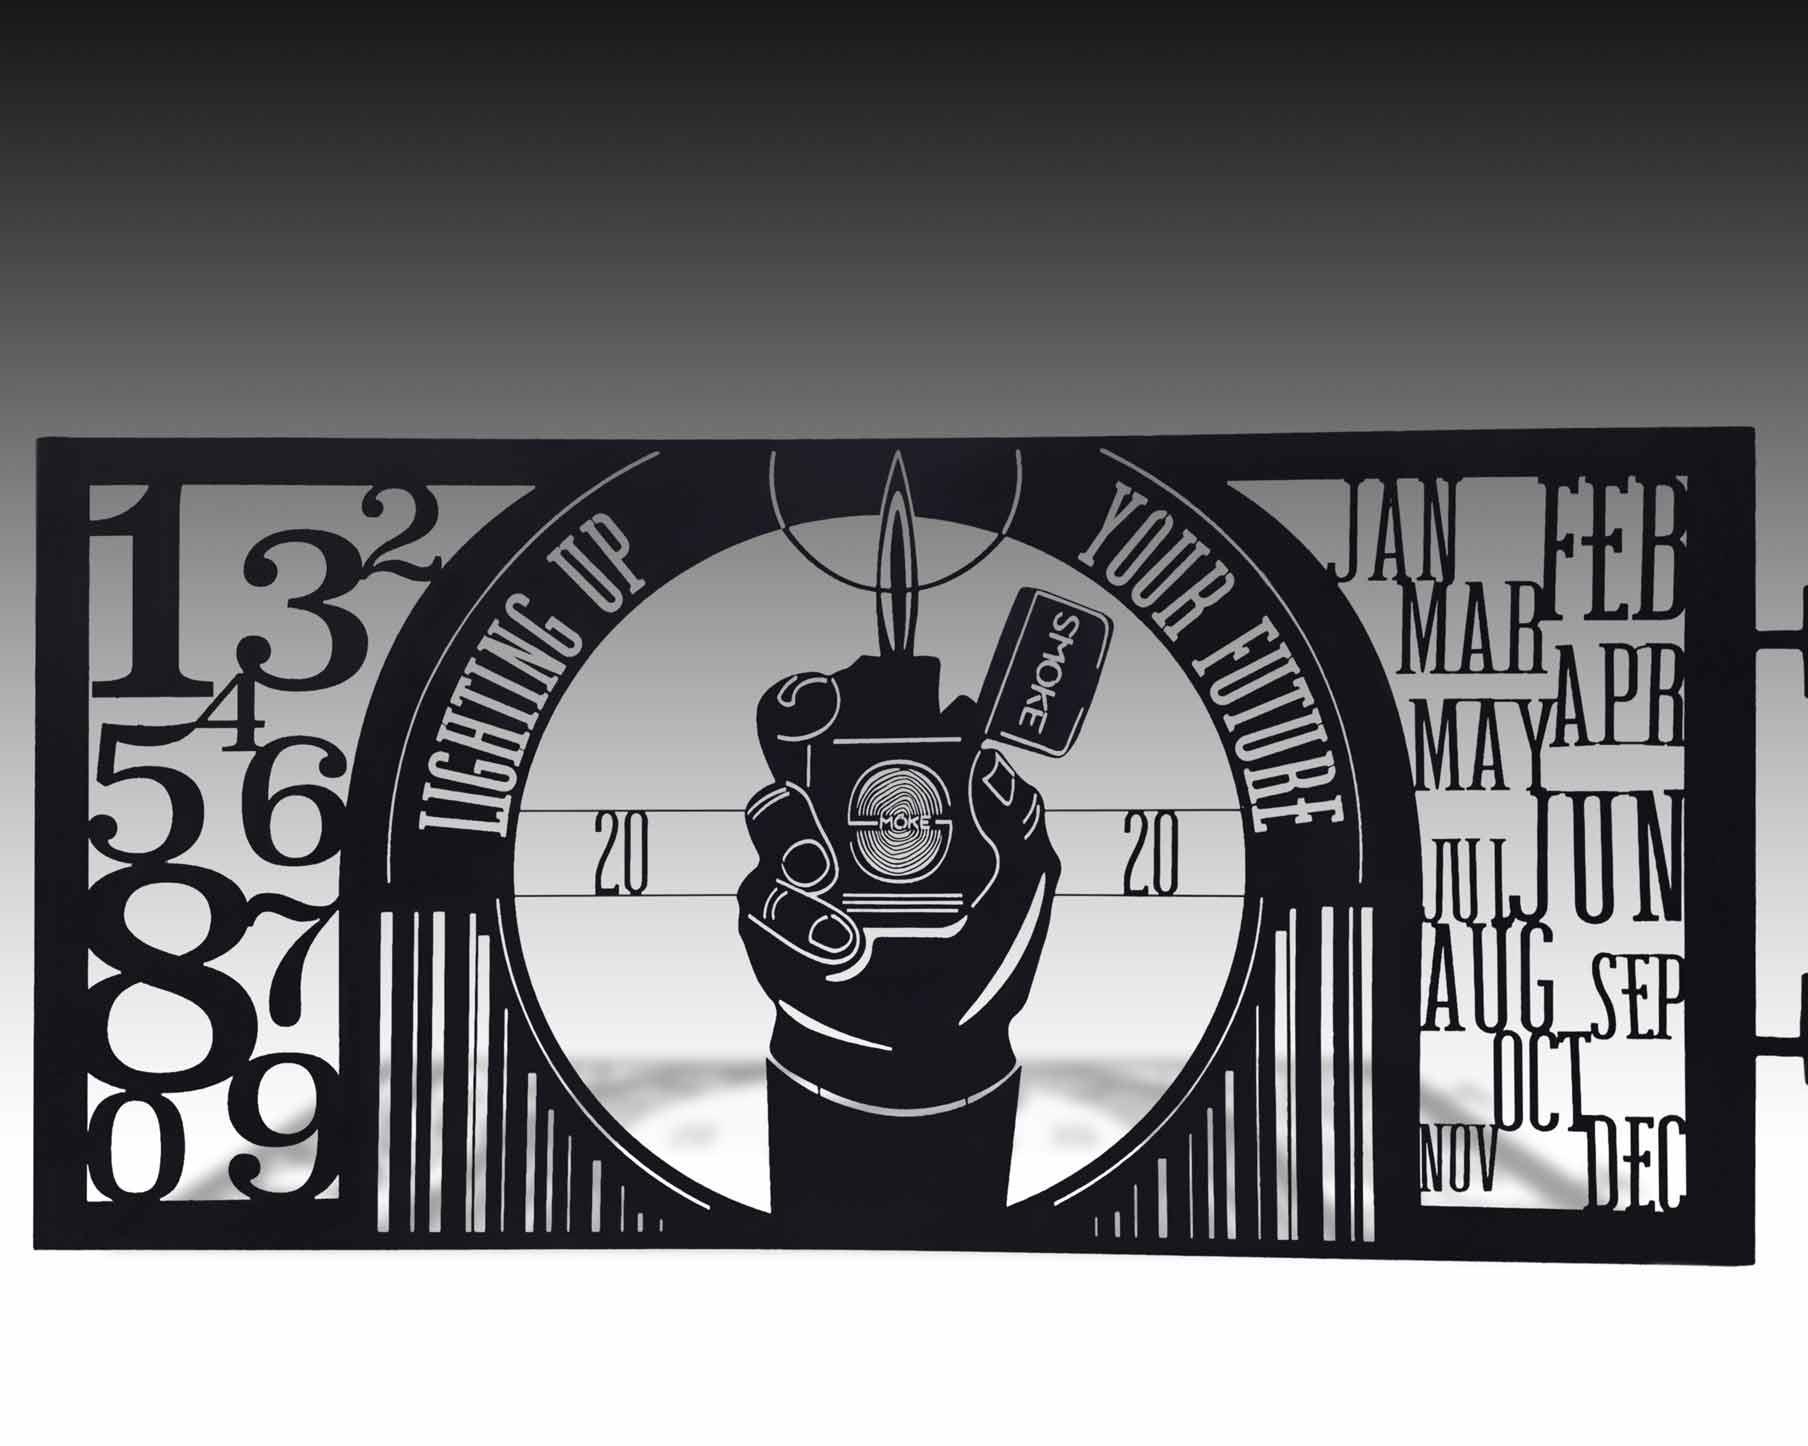 ligthing-up-your-furture metal signage